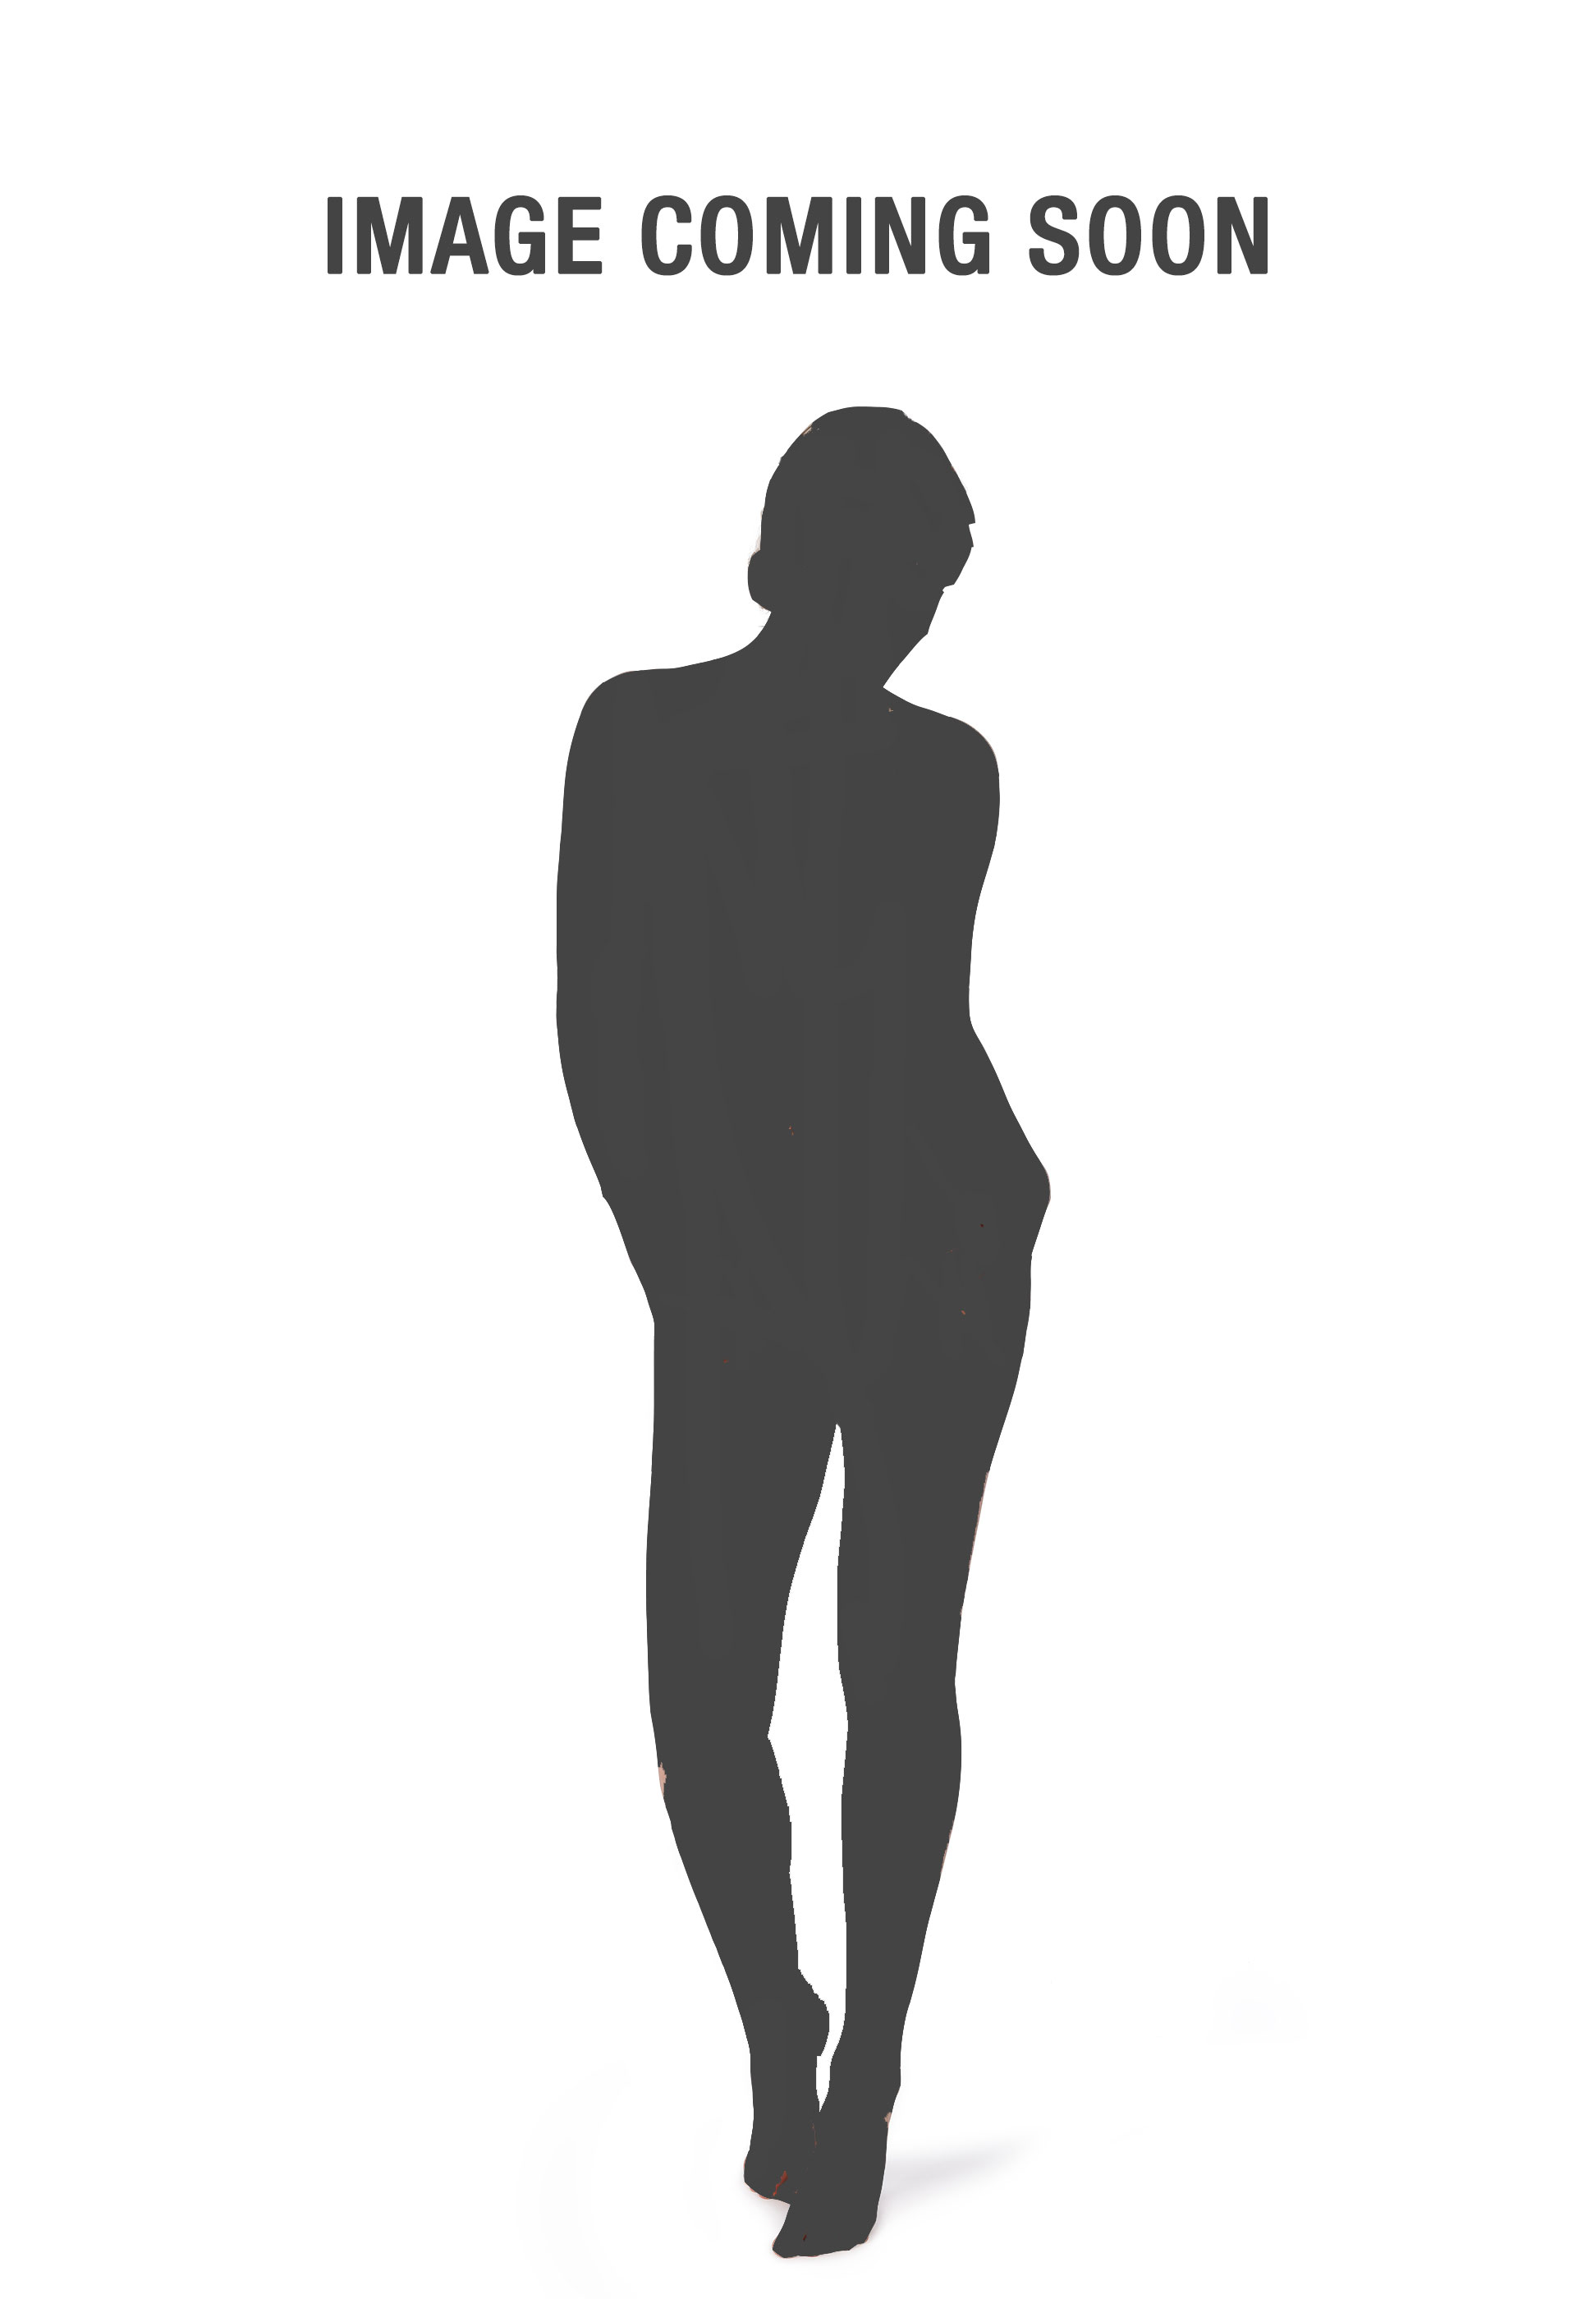 Huber_Basic_M_24hoursmensleep_shorts_117797_019612_010.jpg